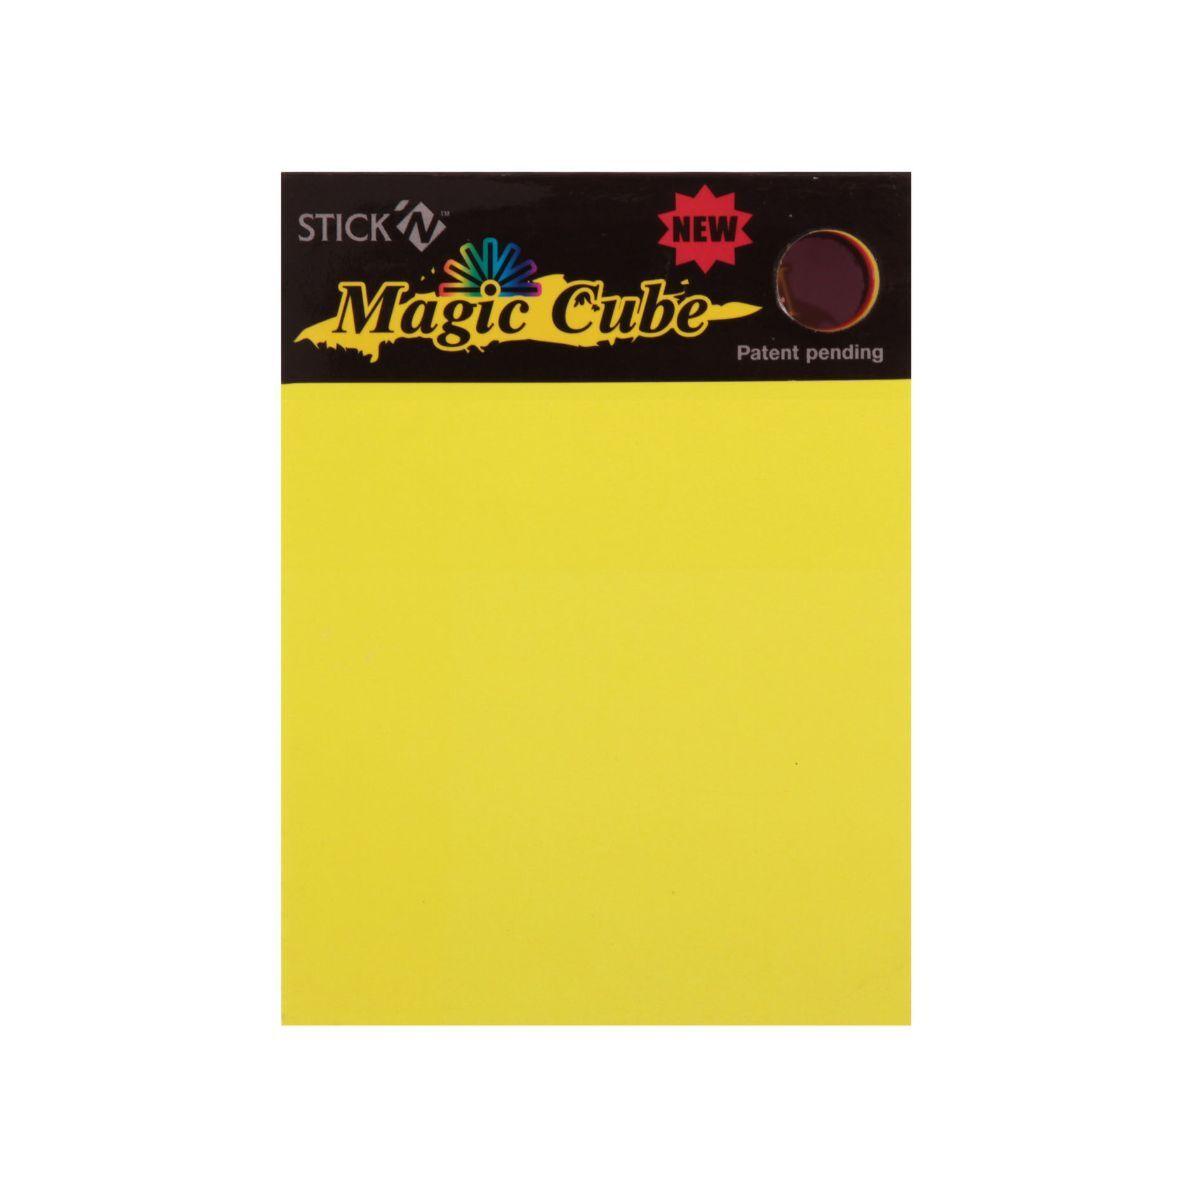 Stick N Magic Cube 101x76mm 280 Sheets 7 Colours